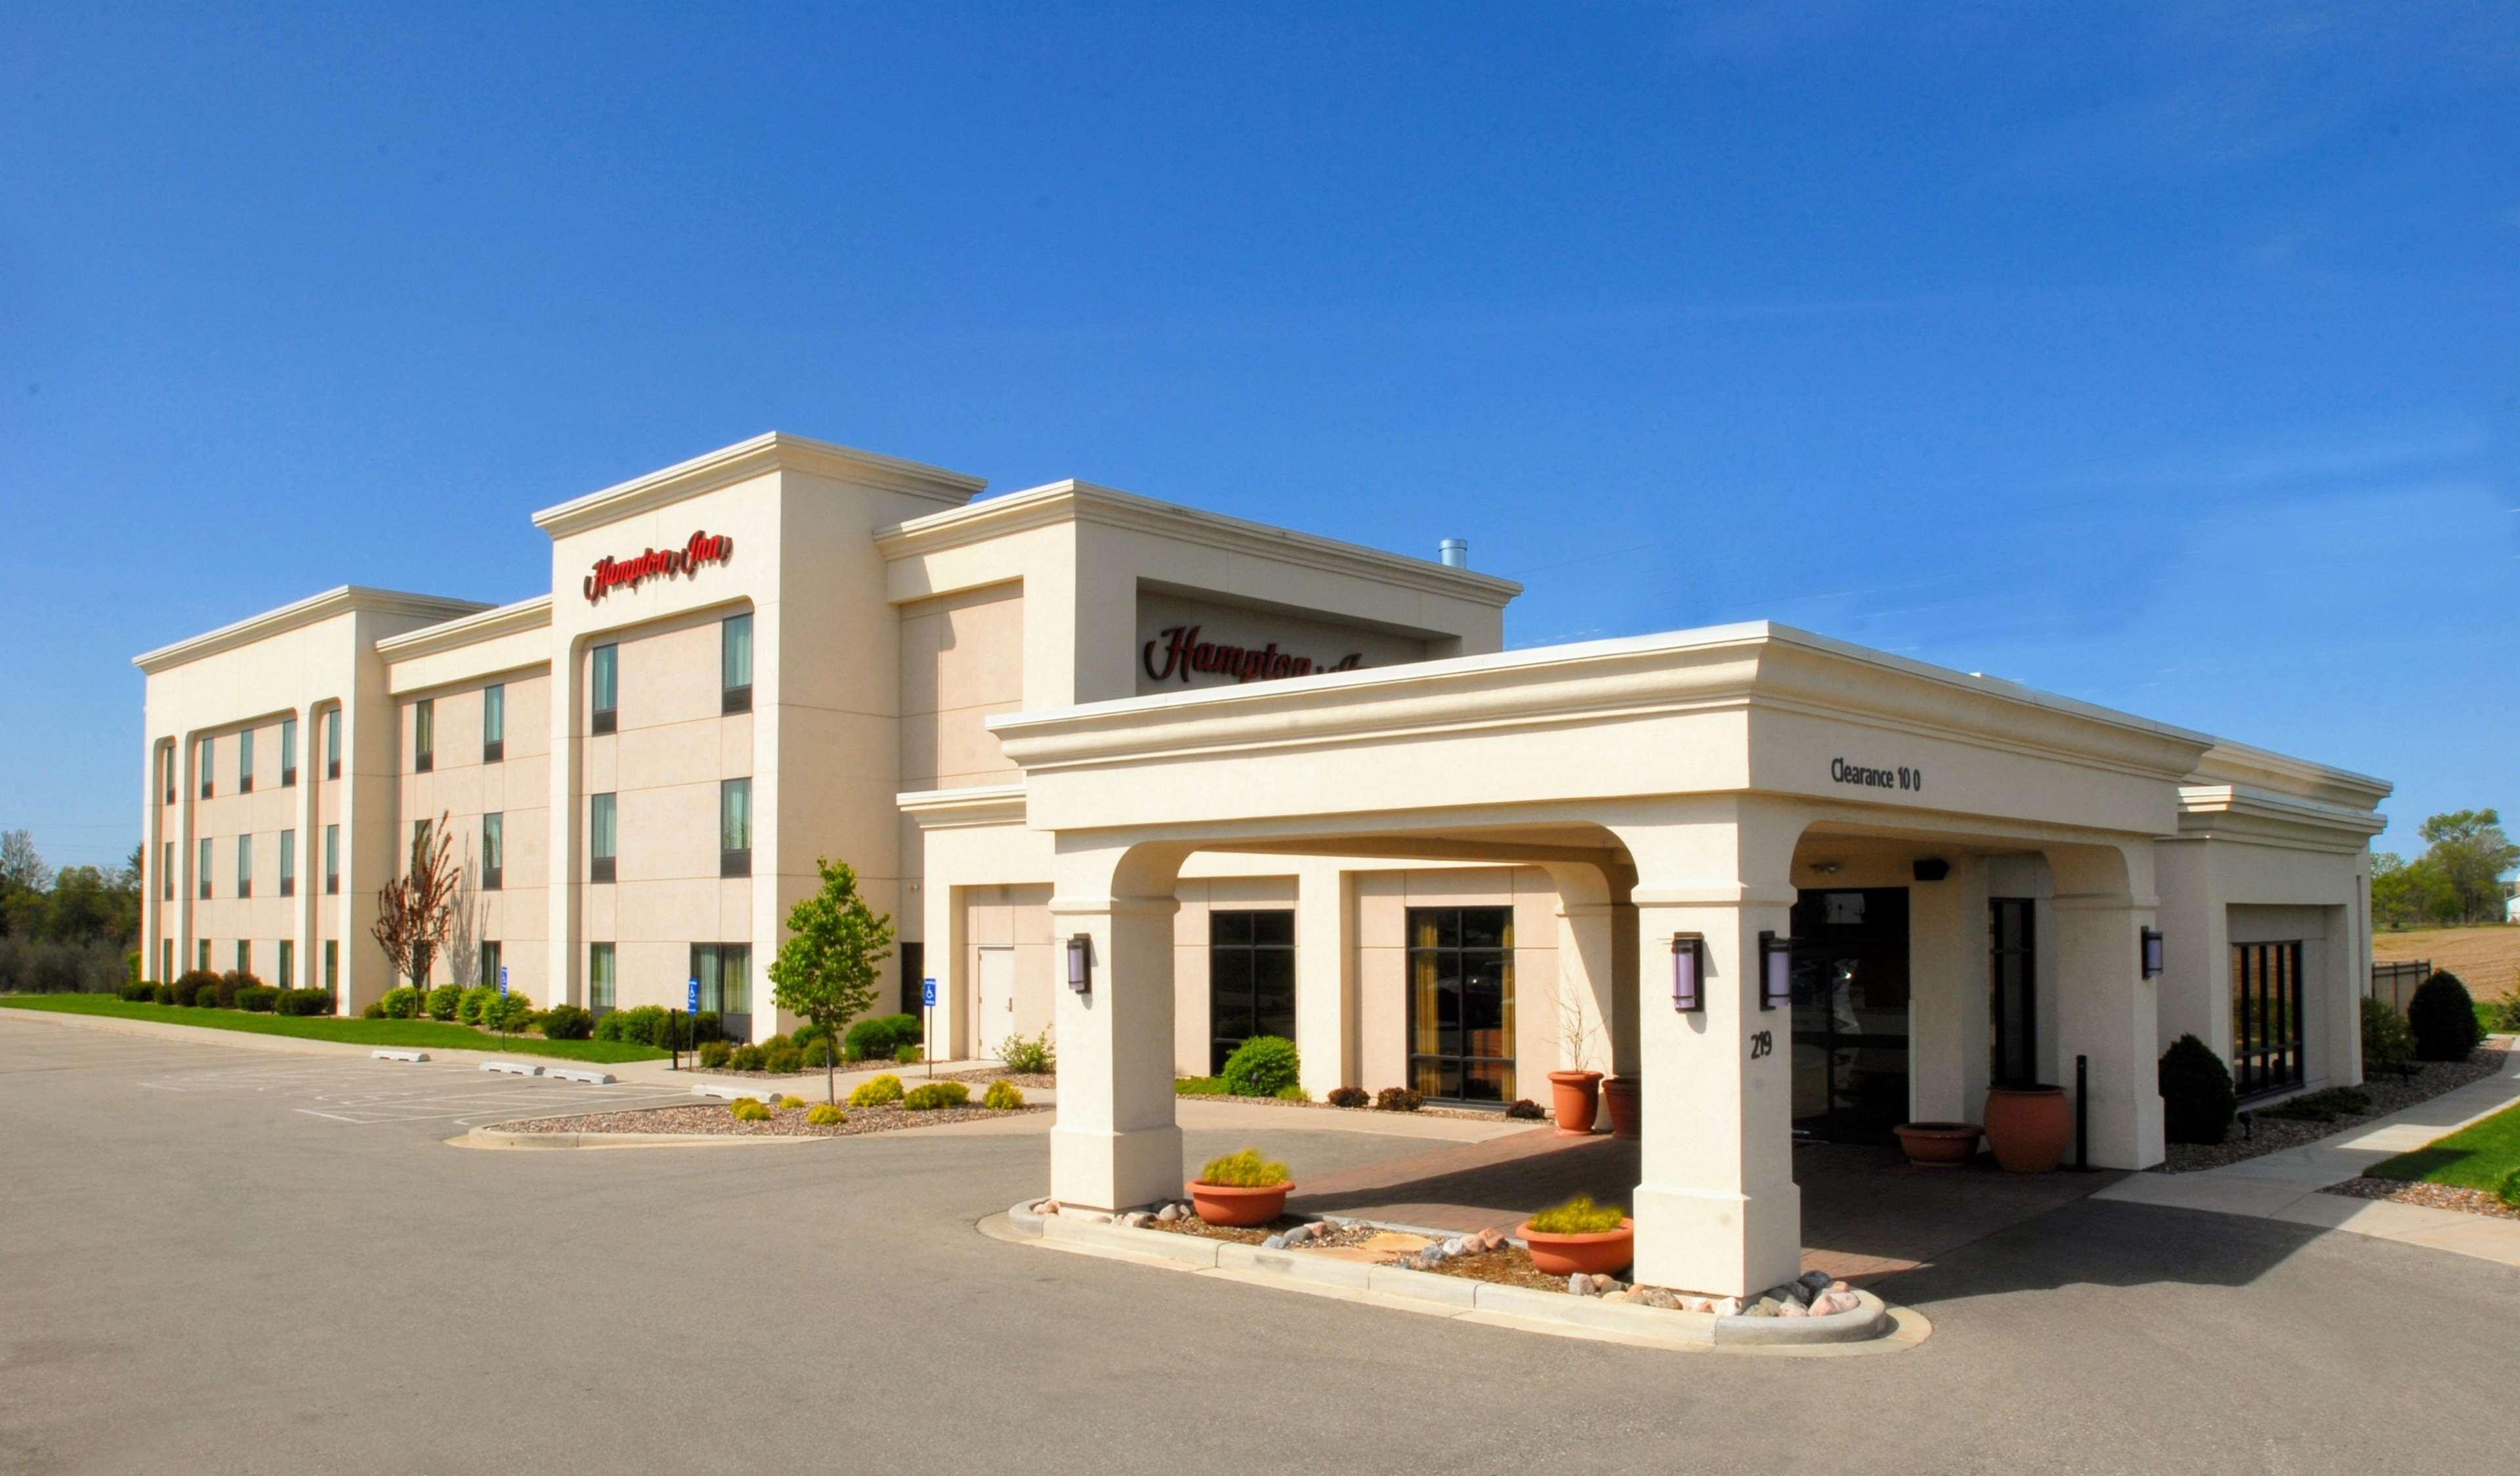 Tomah Wi Hotels Motels